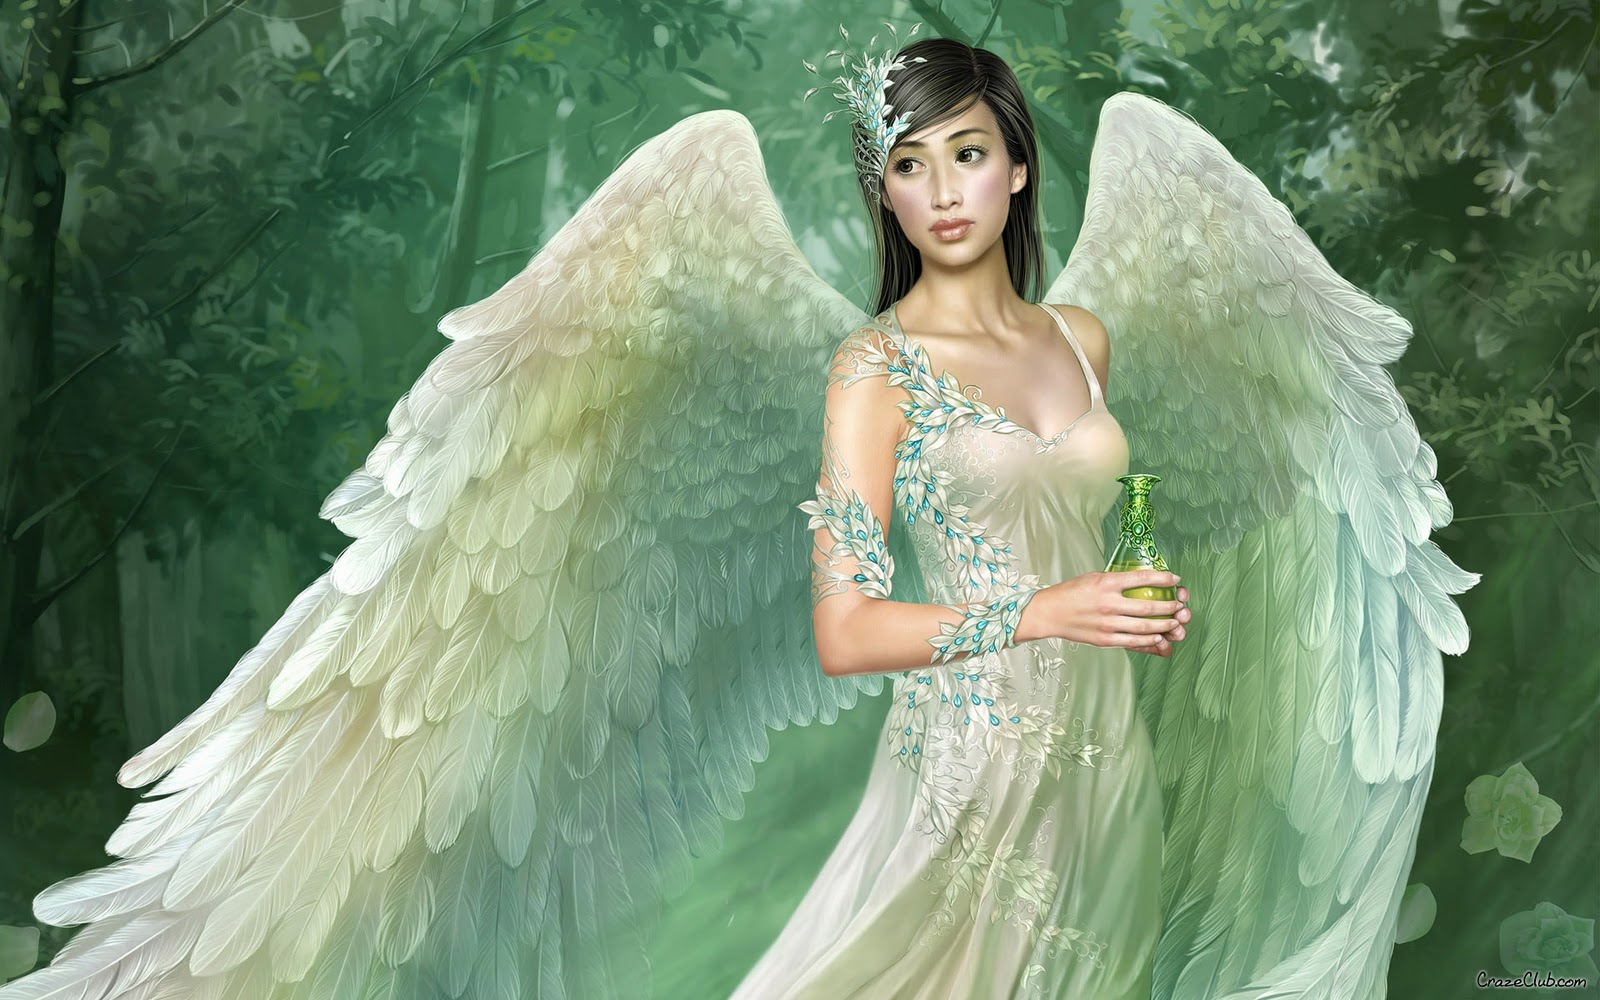 http://1.bp.blogspot.com/_c72kc4JbsgY/TOGBrPEDIHI/AAAAAAAAEPw/uFuLTaA-vhc/s1600/fantasy-cg-girls-wallpaper+%252819%2529.jpg